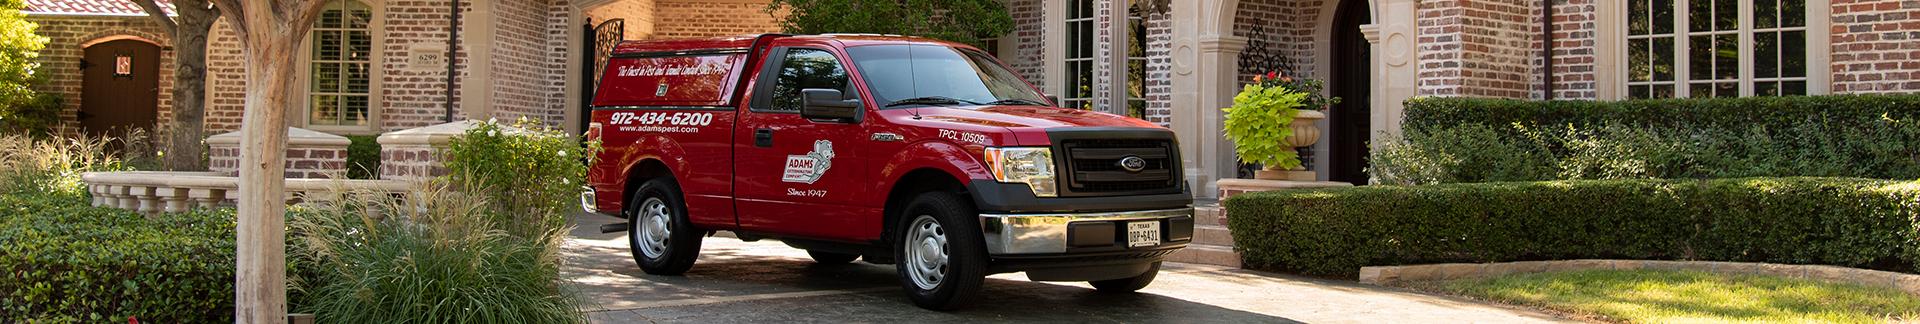 adams pest control's truck in richardson tx